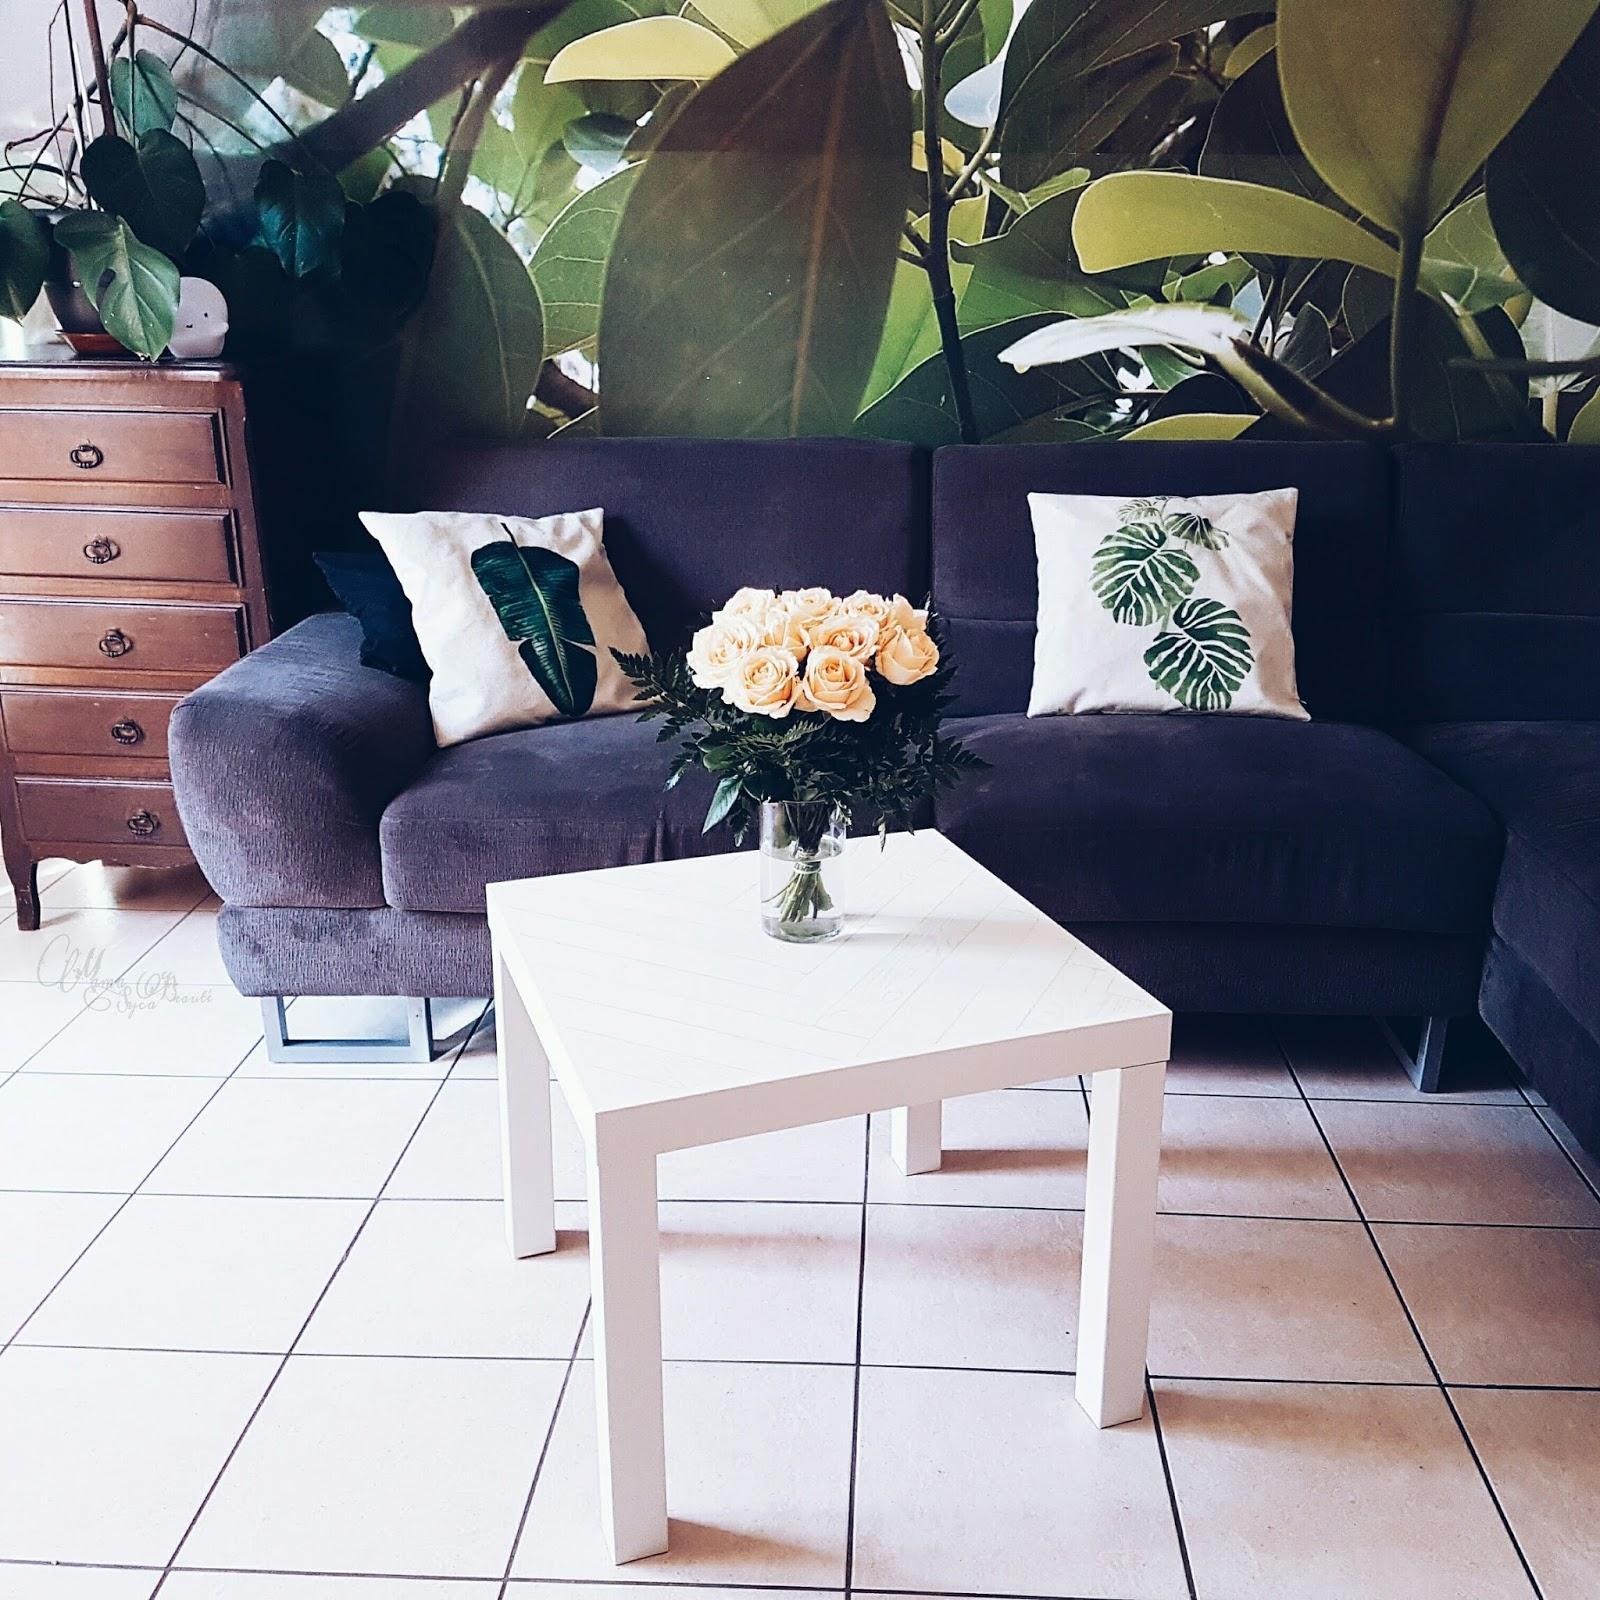 table_personnalisee-coque_unique_avis_deco_mama_syca_beaute